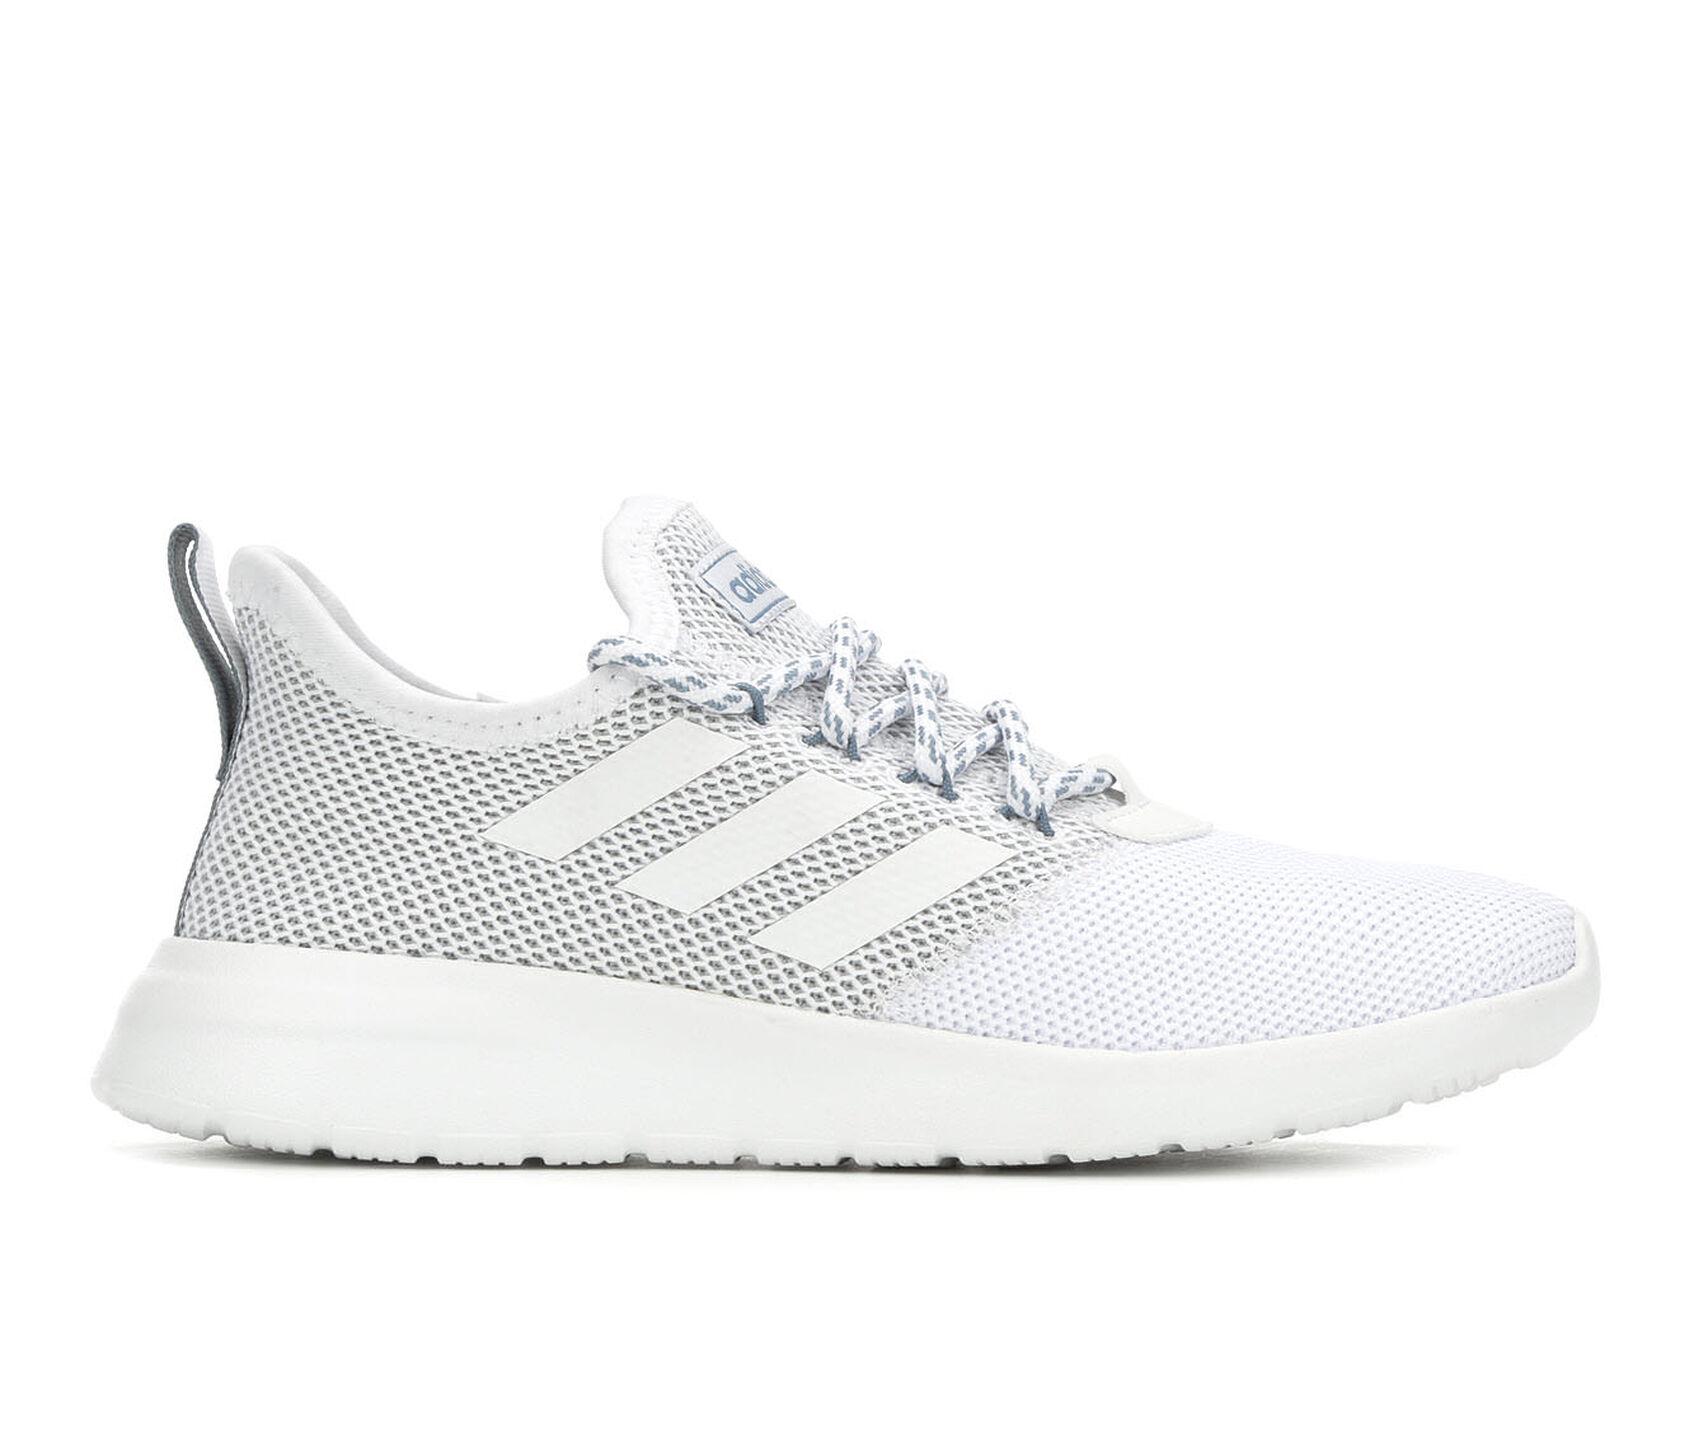 38e04786a75 Women's Adidas Lite Racer Reborn Sneakers | Shoe Carnival